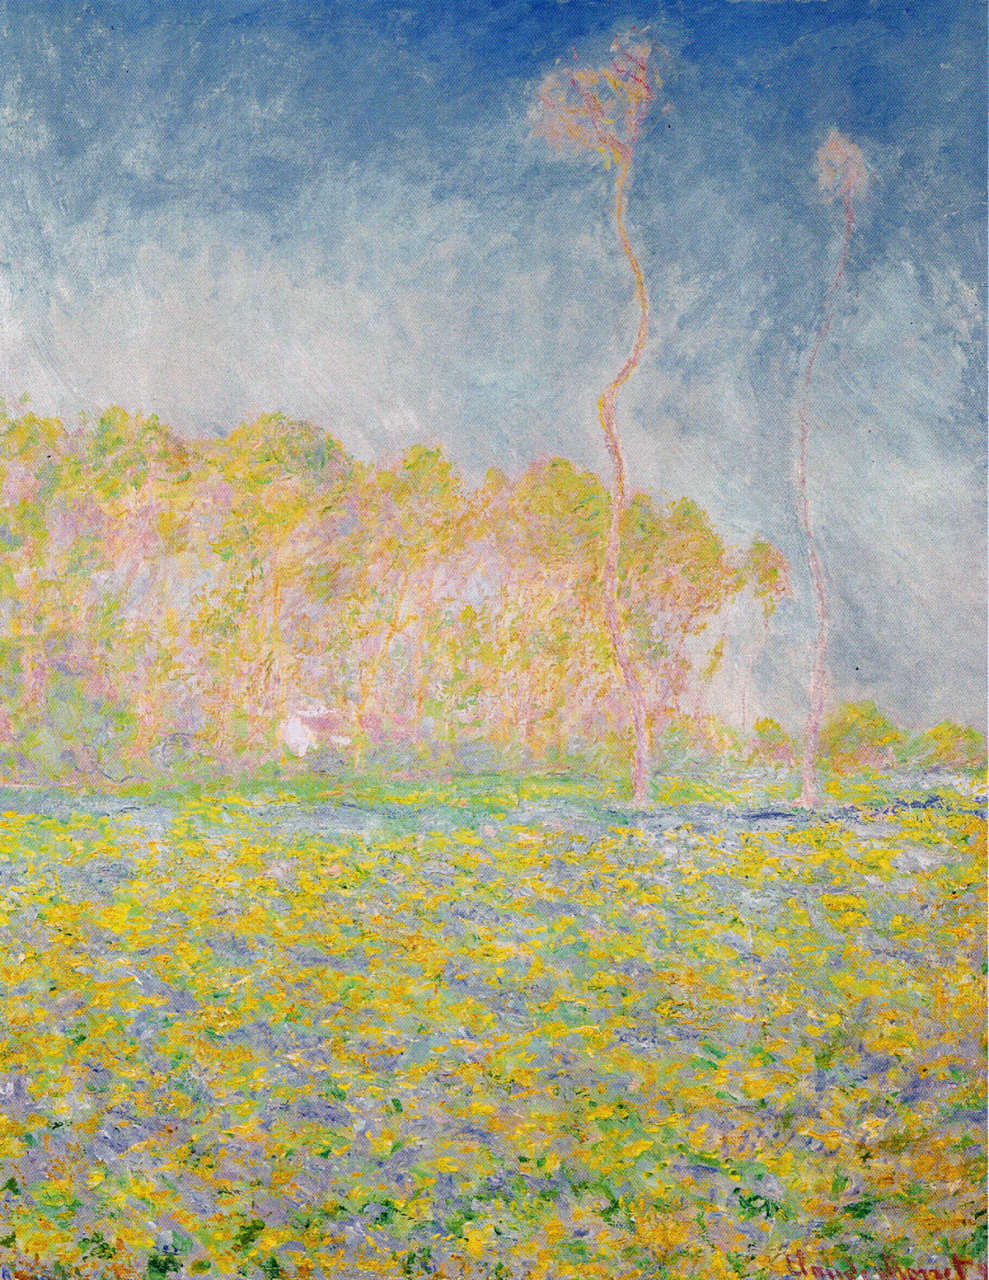 Springtime Landscape, 1894 #monet #frenchart https://t.co/mexosGaaey